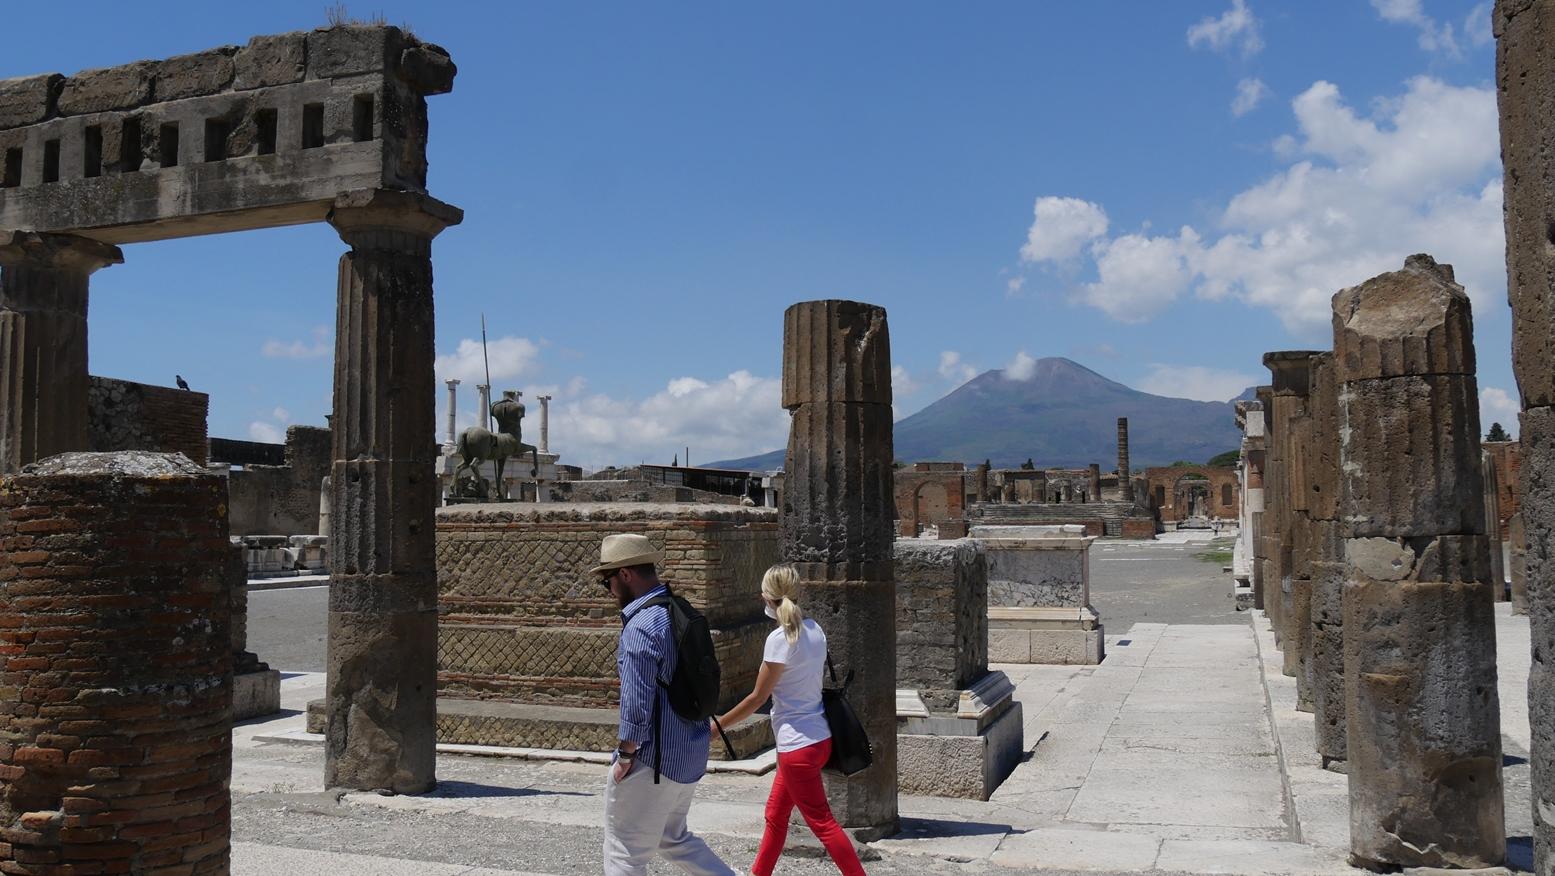 pompei_San-Valentino-agli-scavi_foto-parco-archeologico-pompei